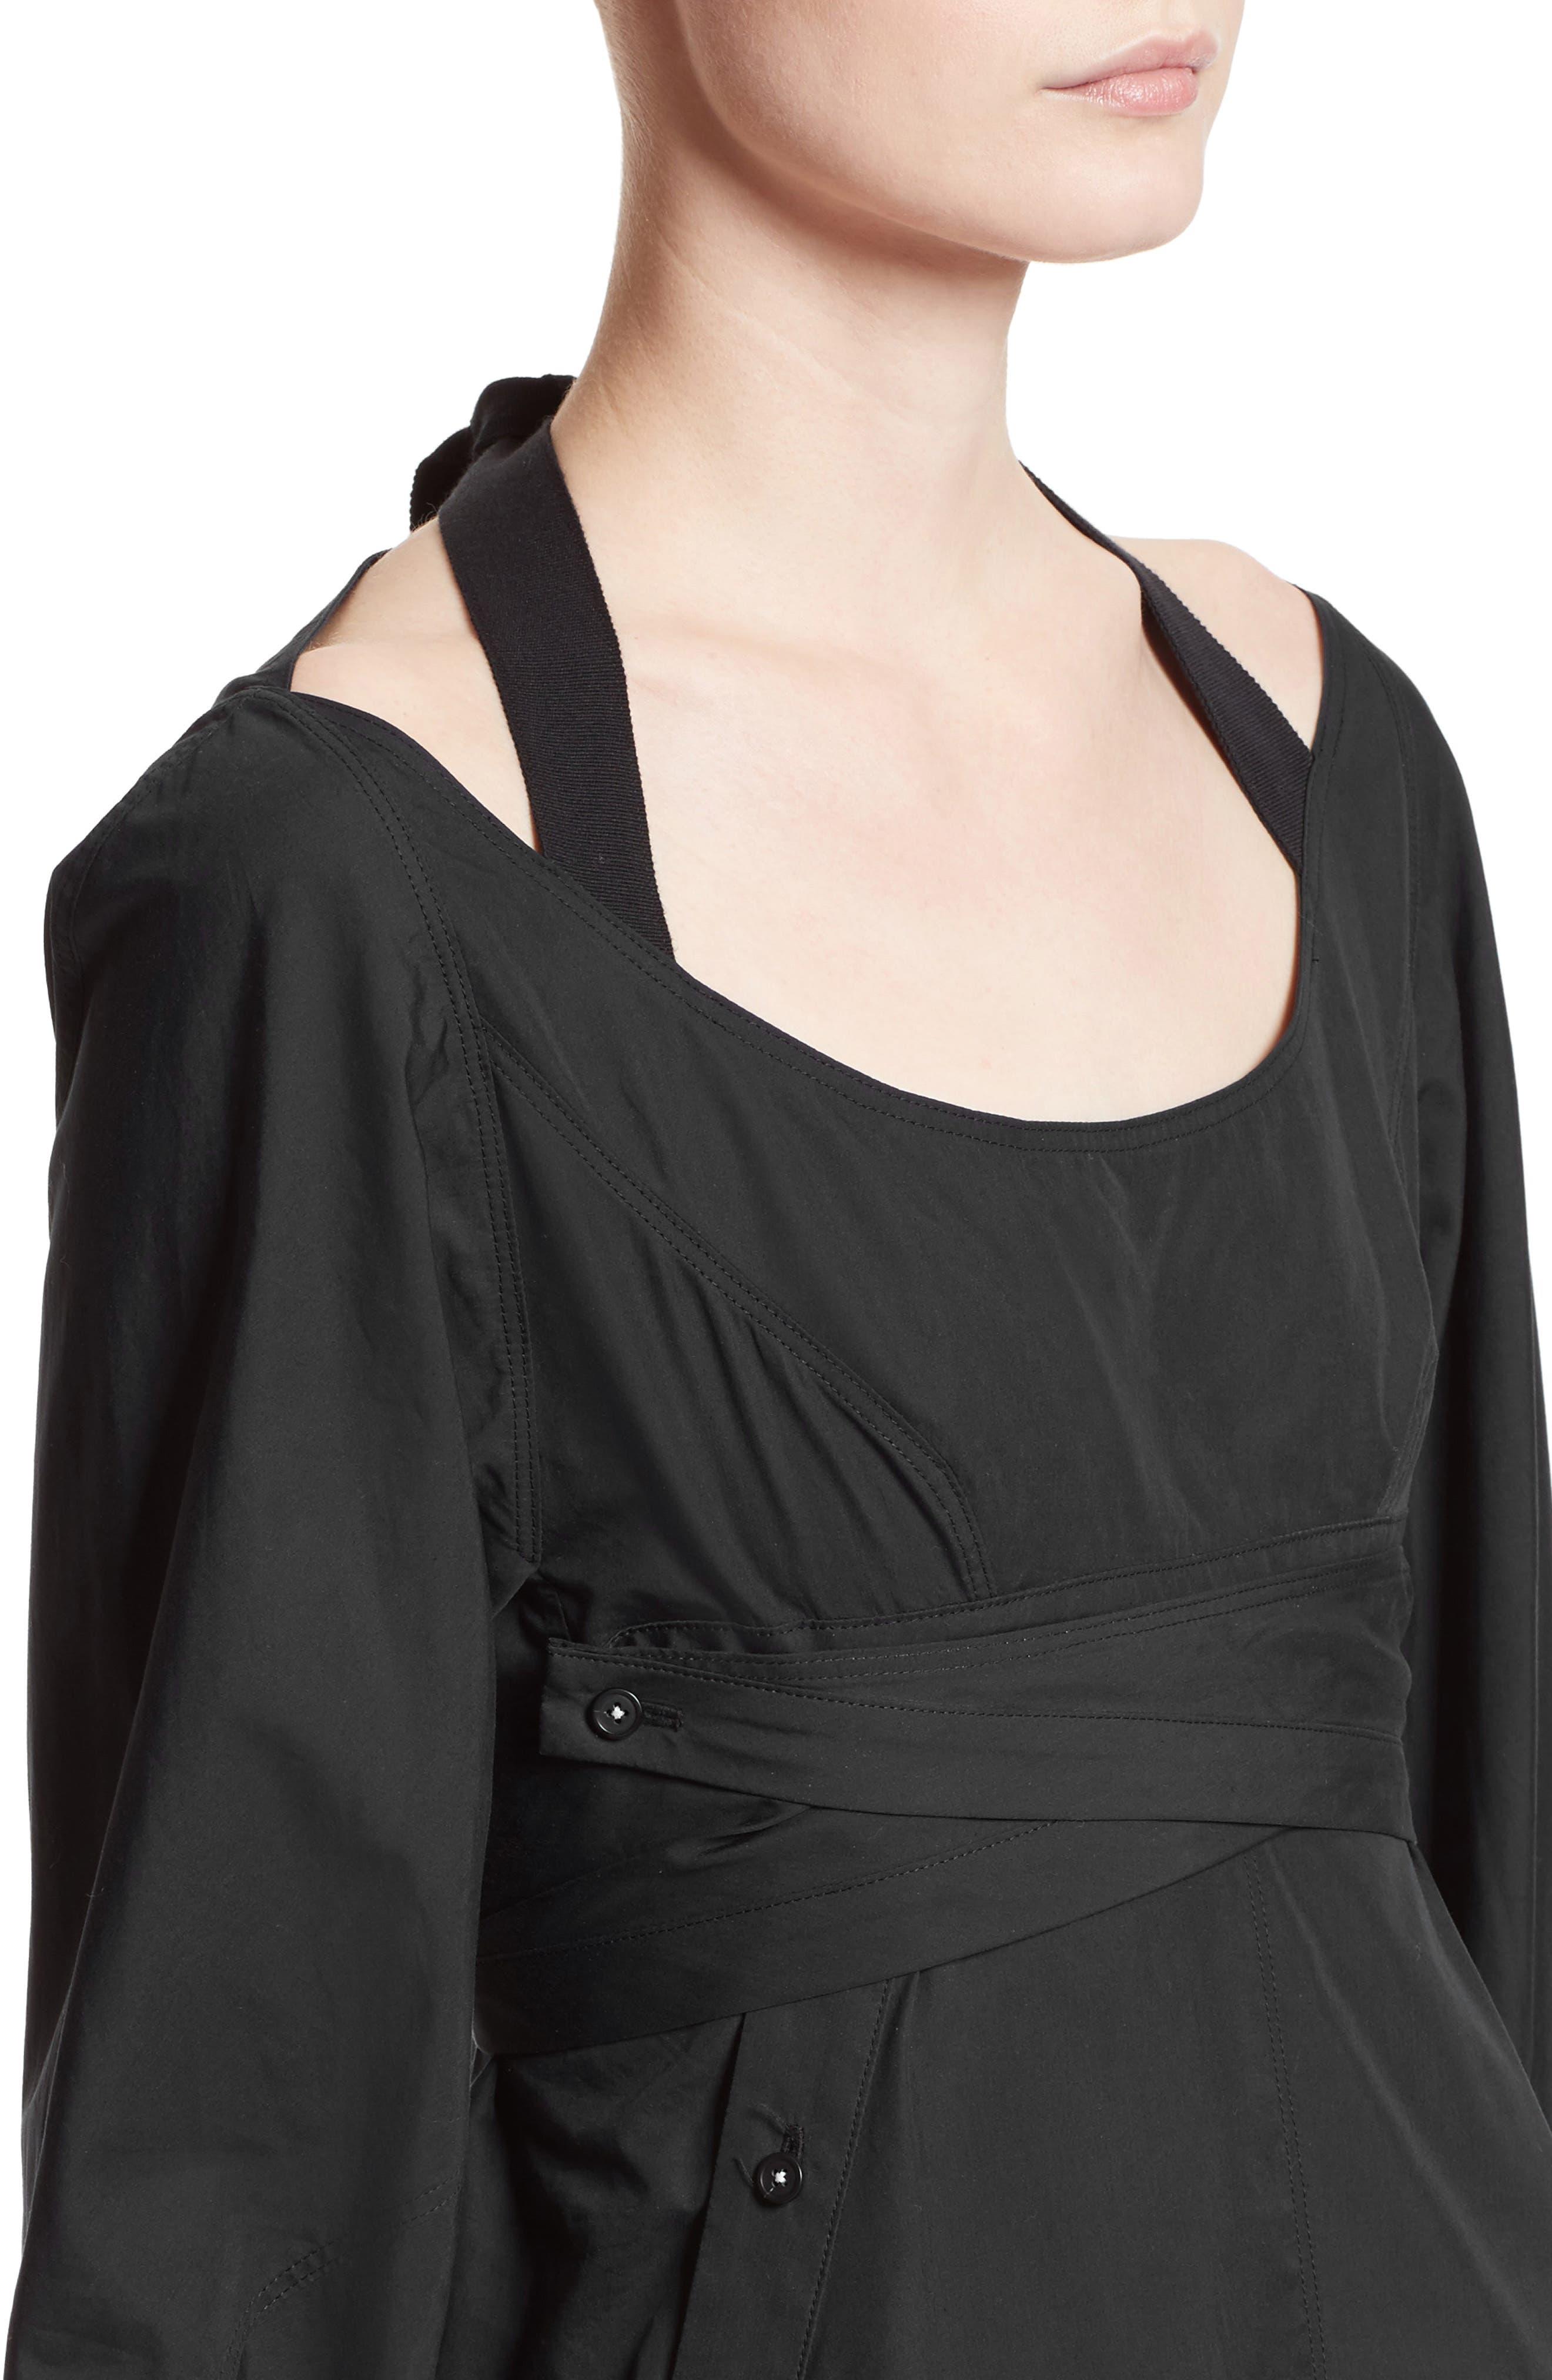 Cotton Poplin Wrap Dress,                             Alternate thumbnail 5, color,                             Black